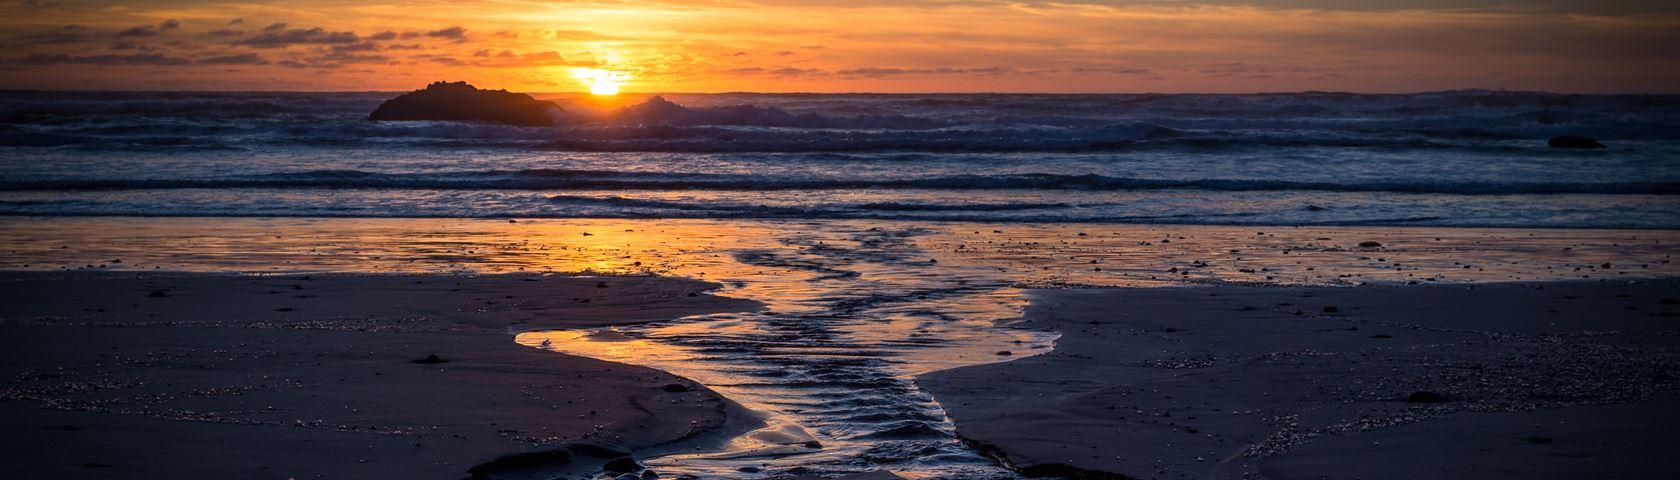 Sunset at Hug Point